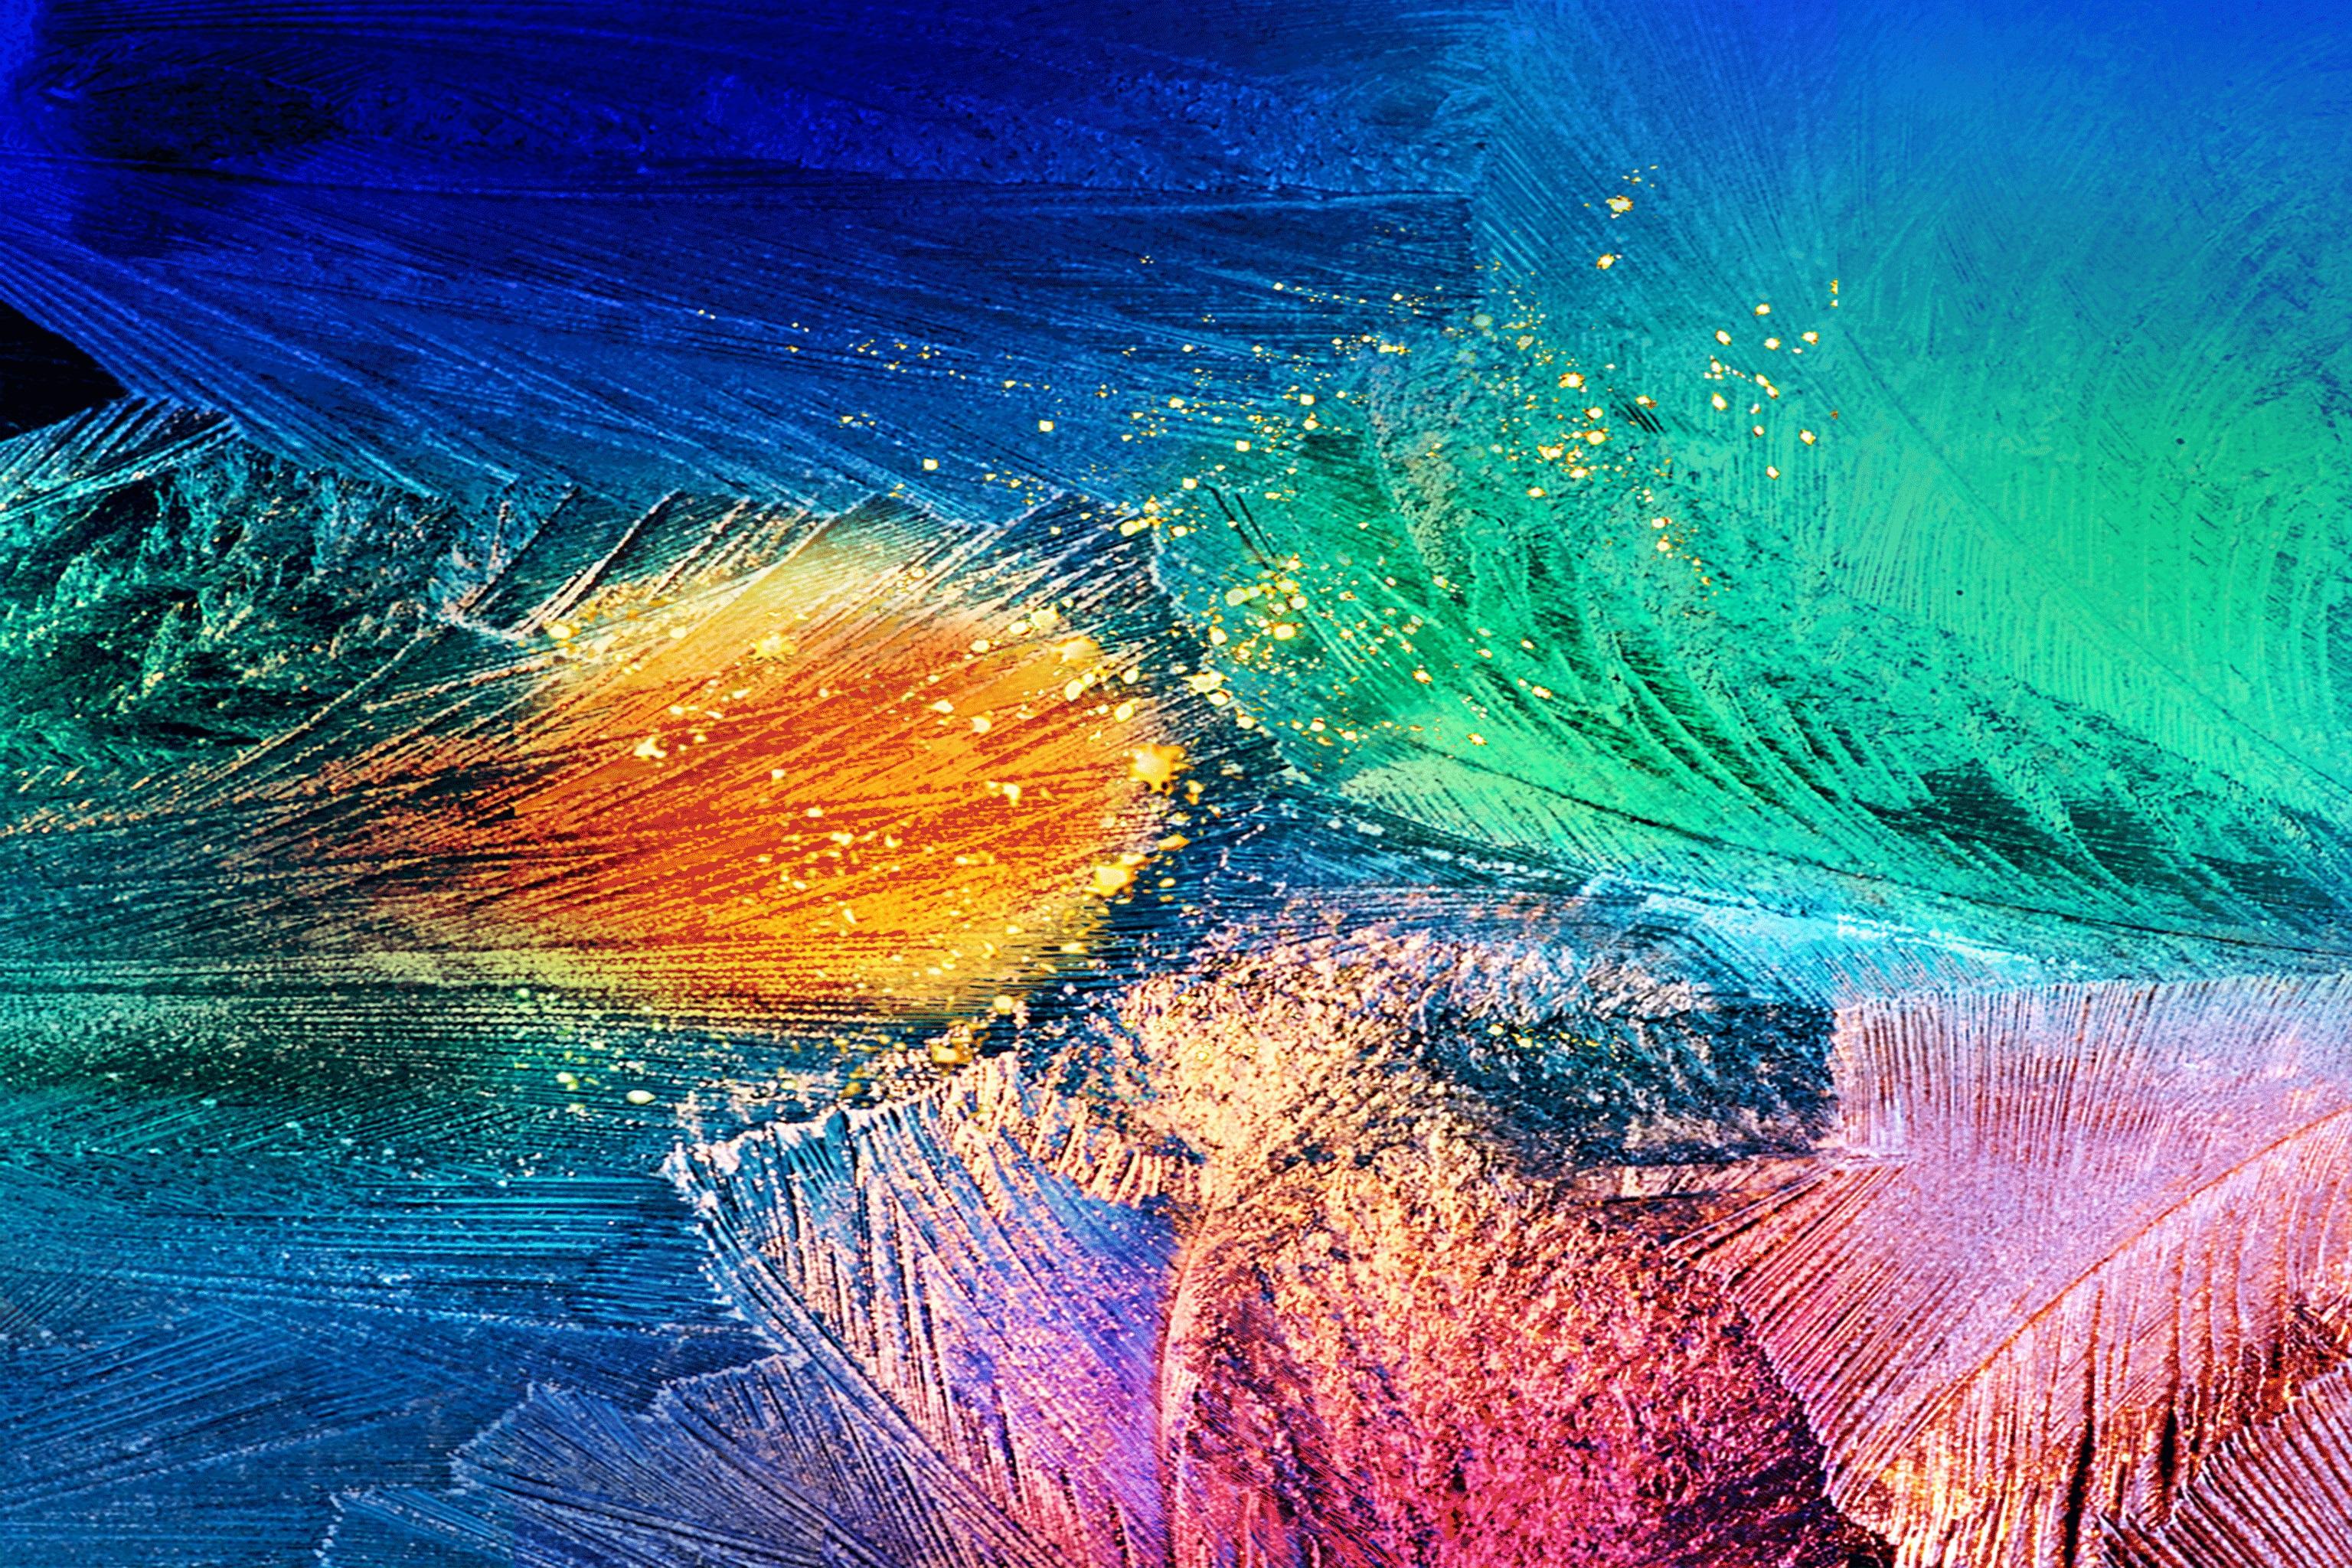 Samsung Galaxy S6 Hd Wallpaper Stock Images Download: Galaxy Note 4 Wallpaper